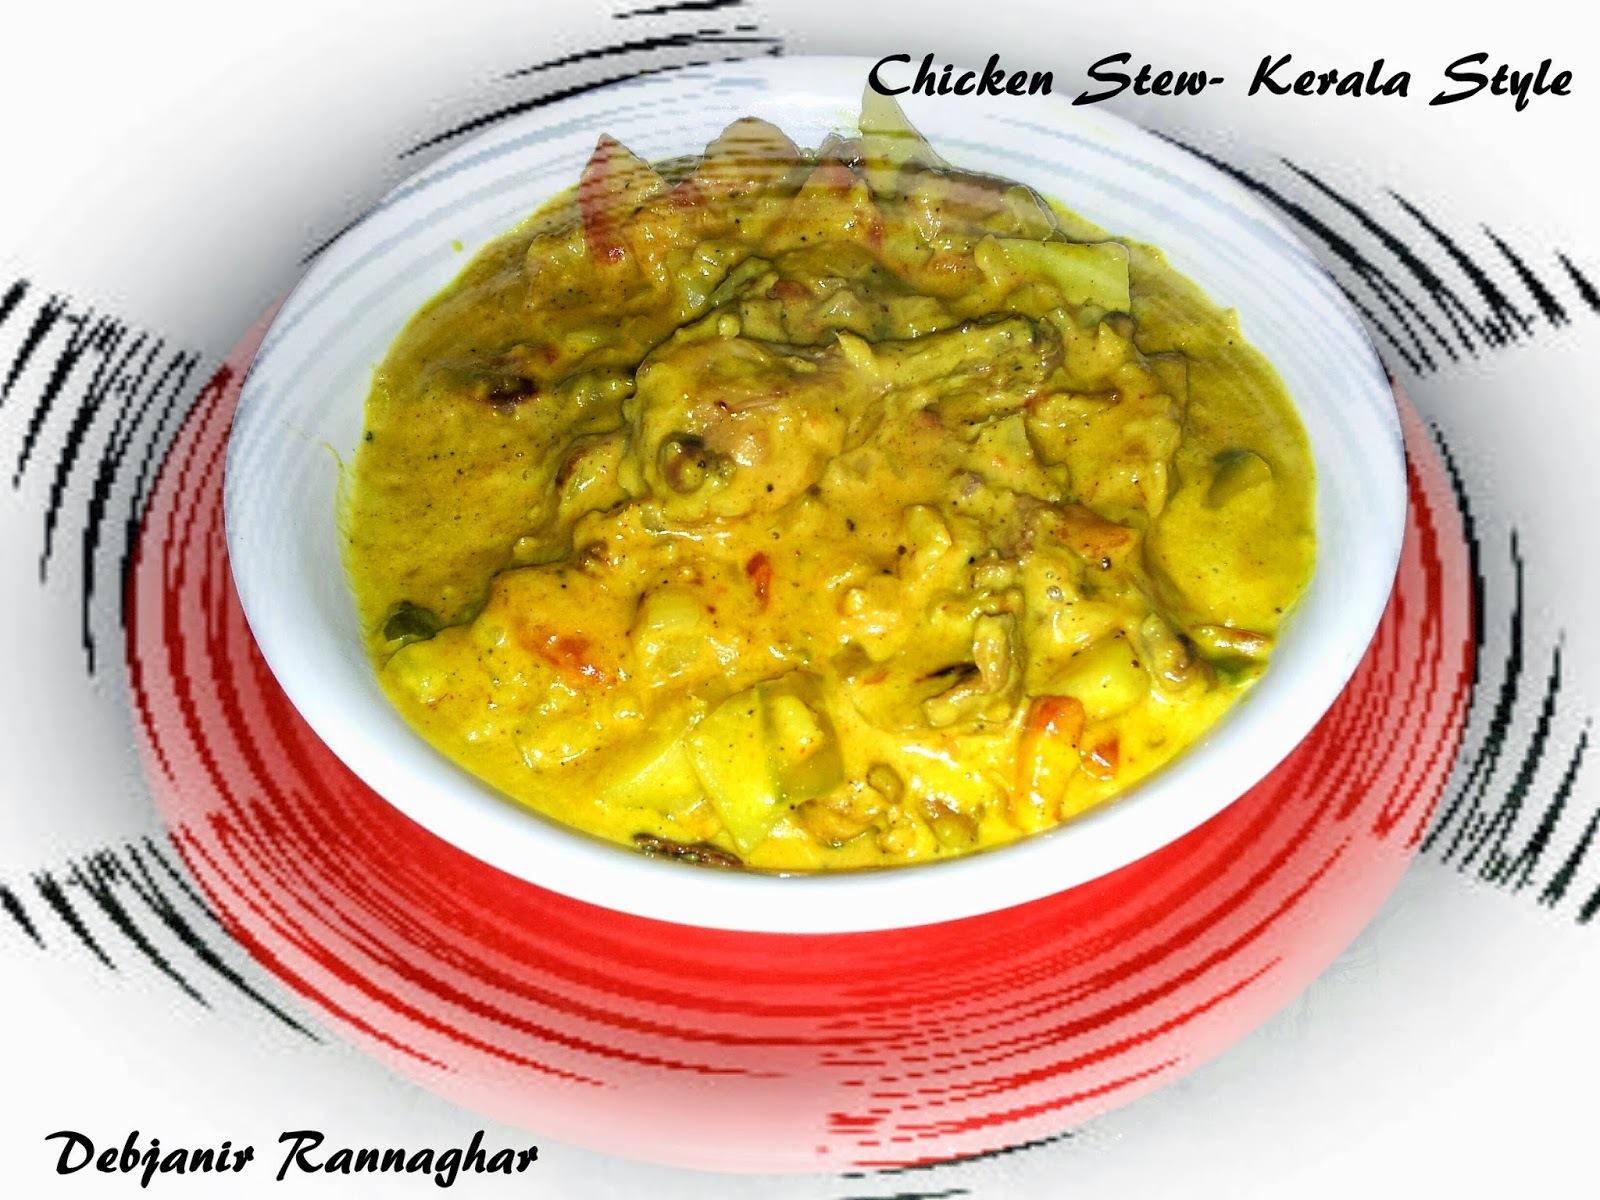 Chicken Stew- Kerala Style